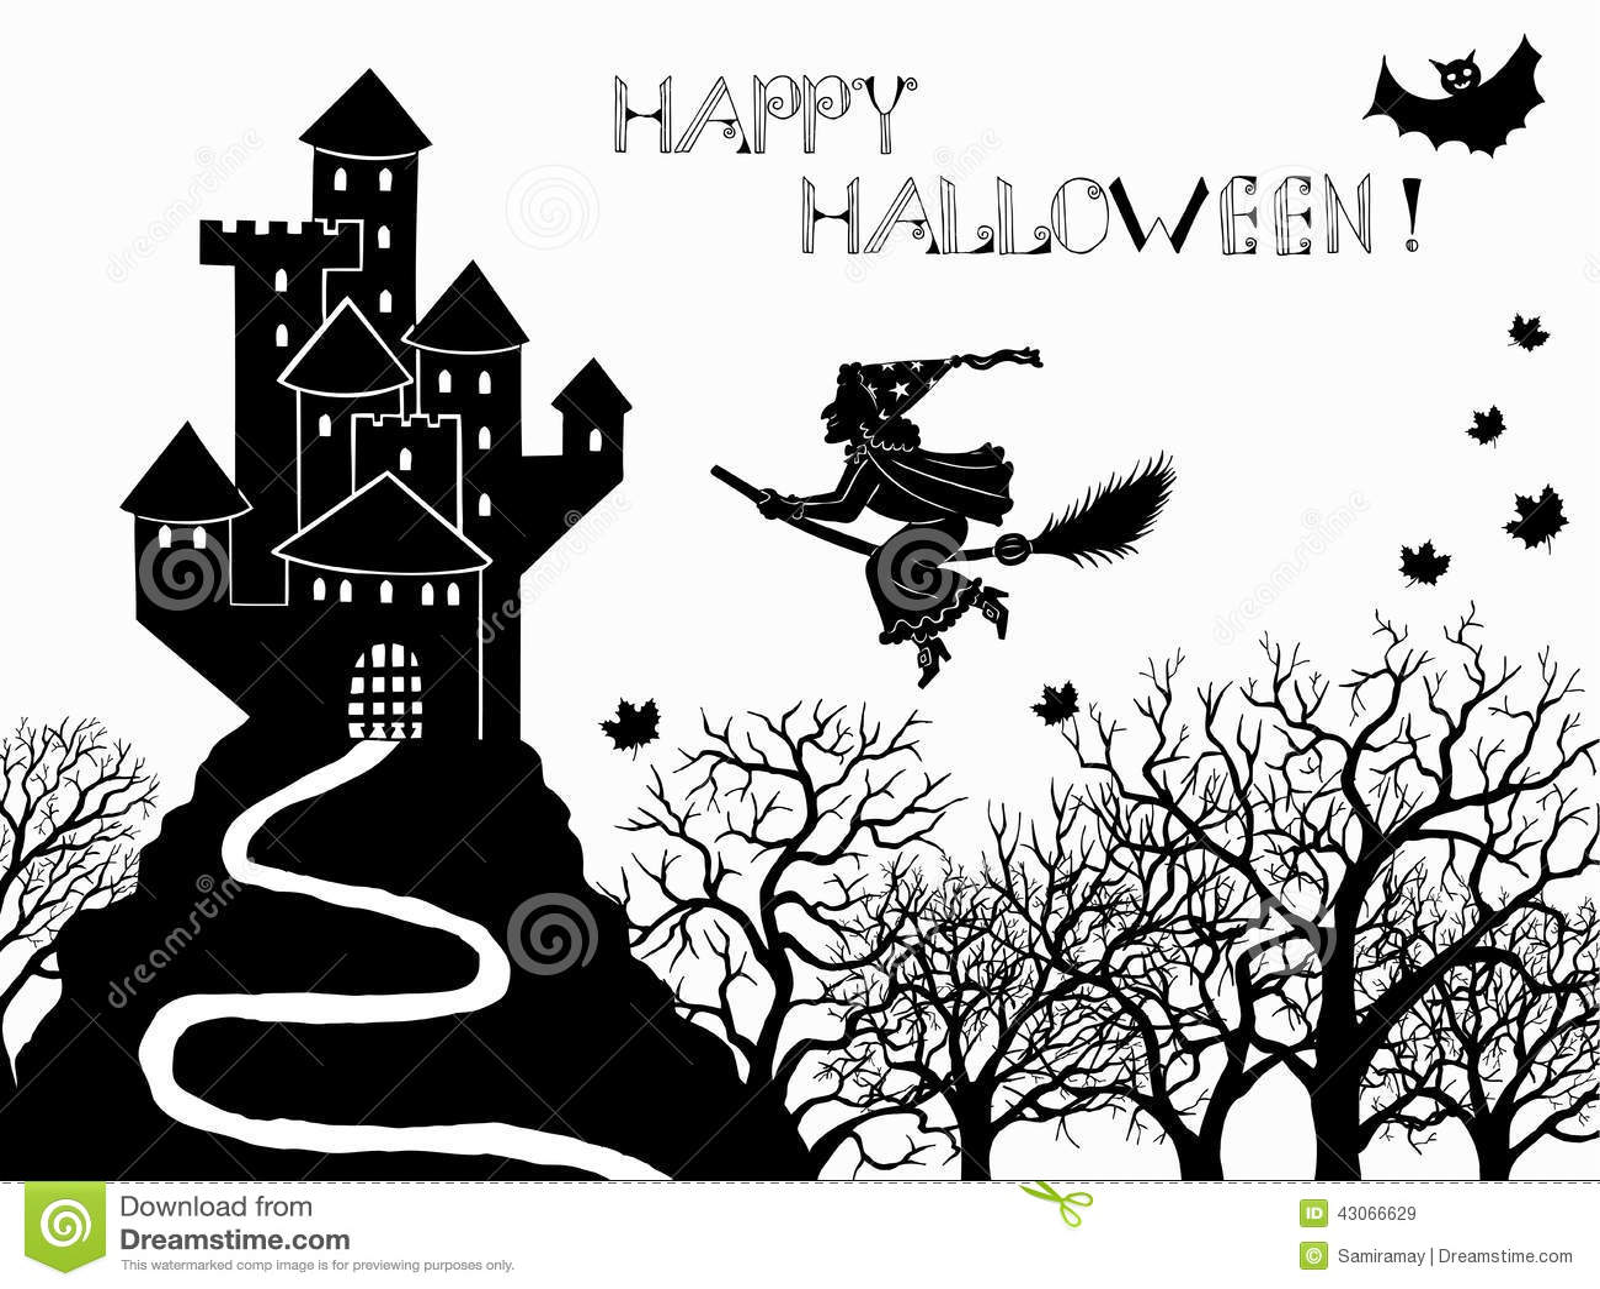 Halloween Invitations Templates was amazing invitations design